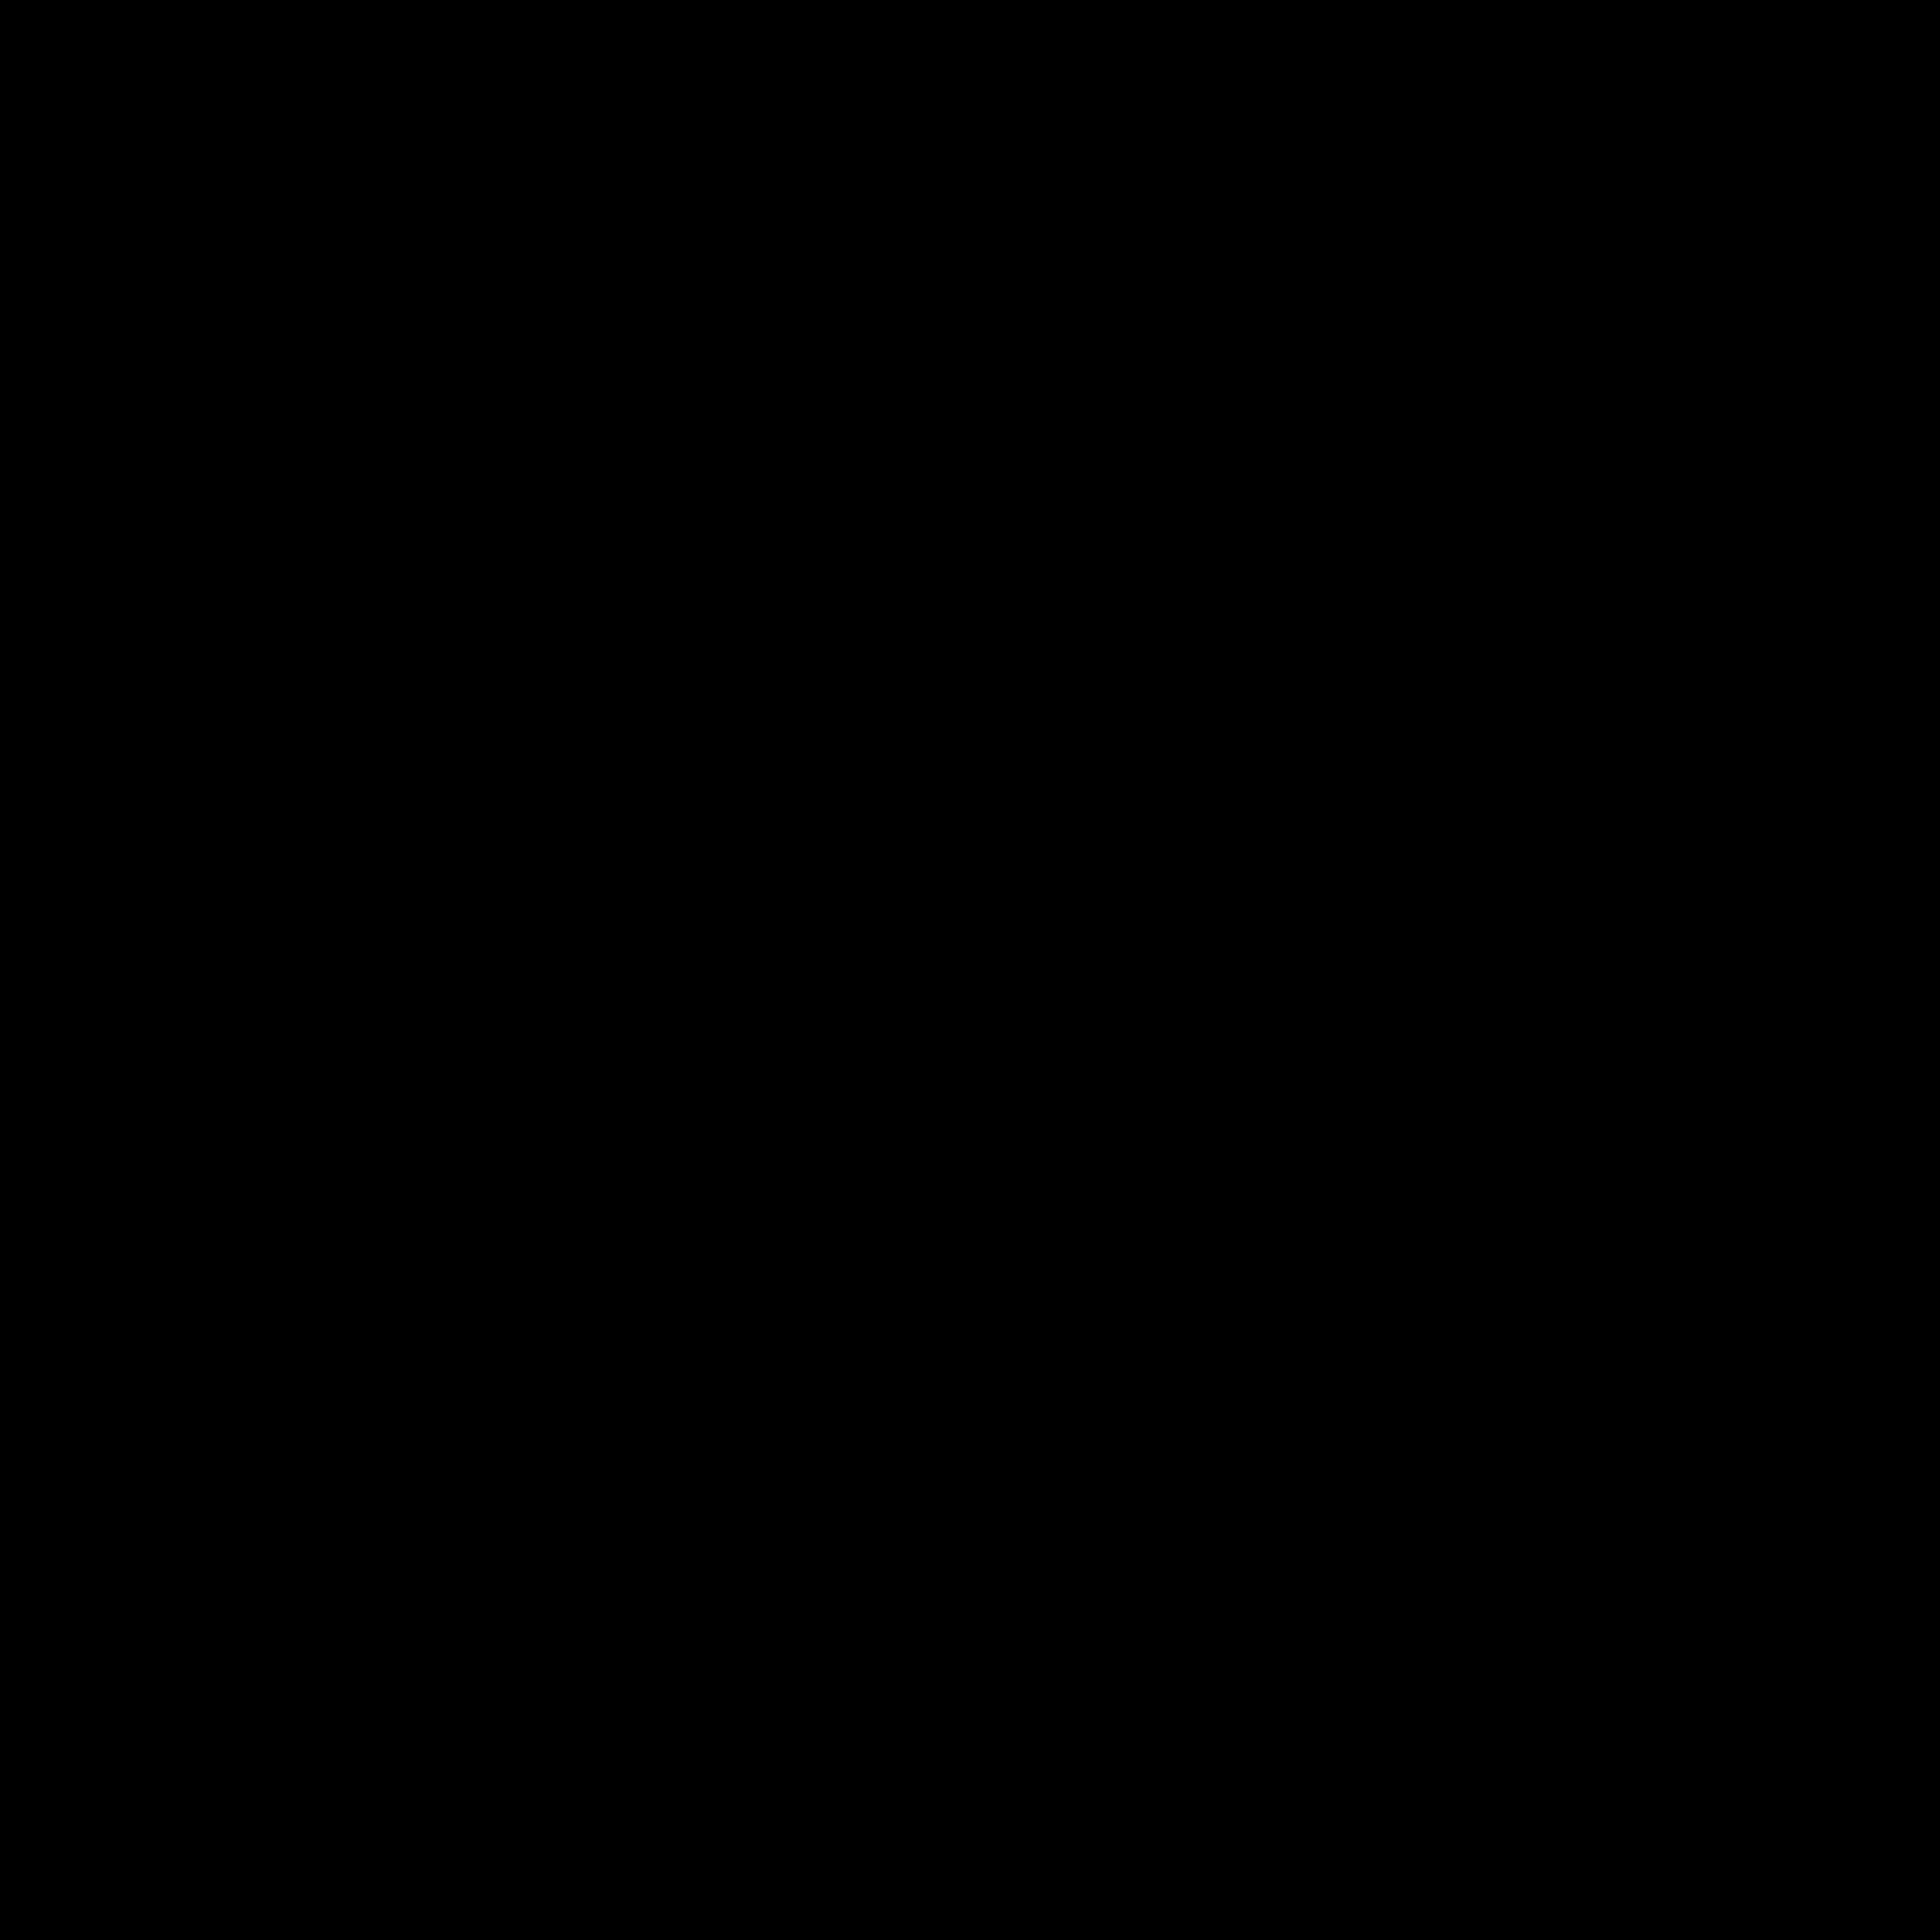 Castle vector png. Logo transparent svg freebie